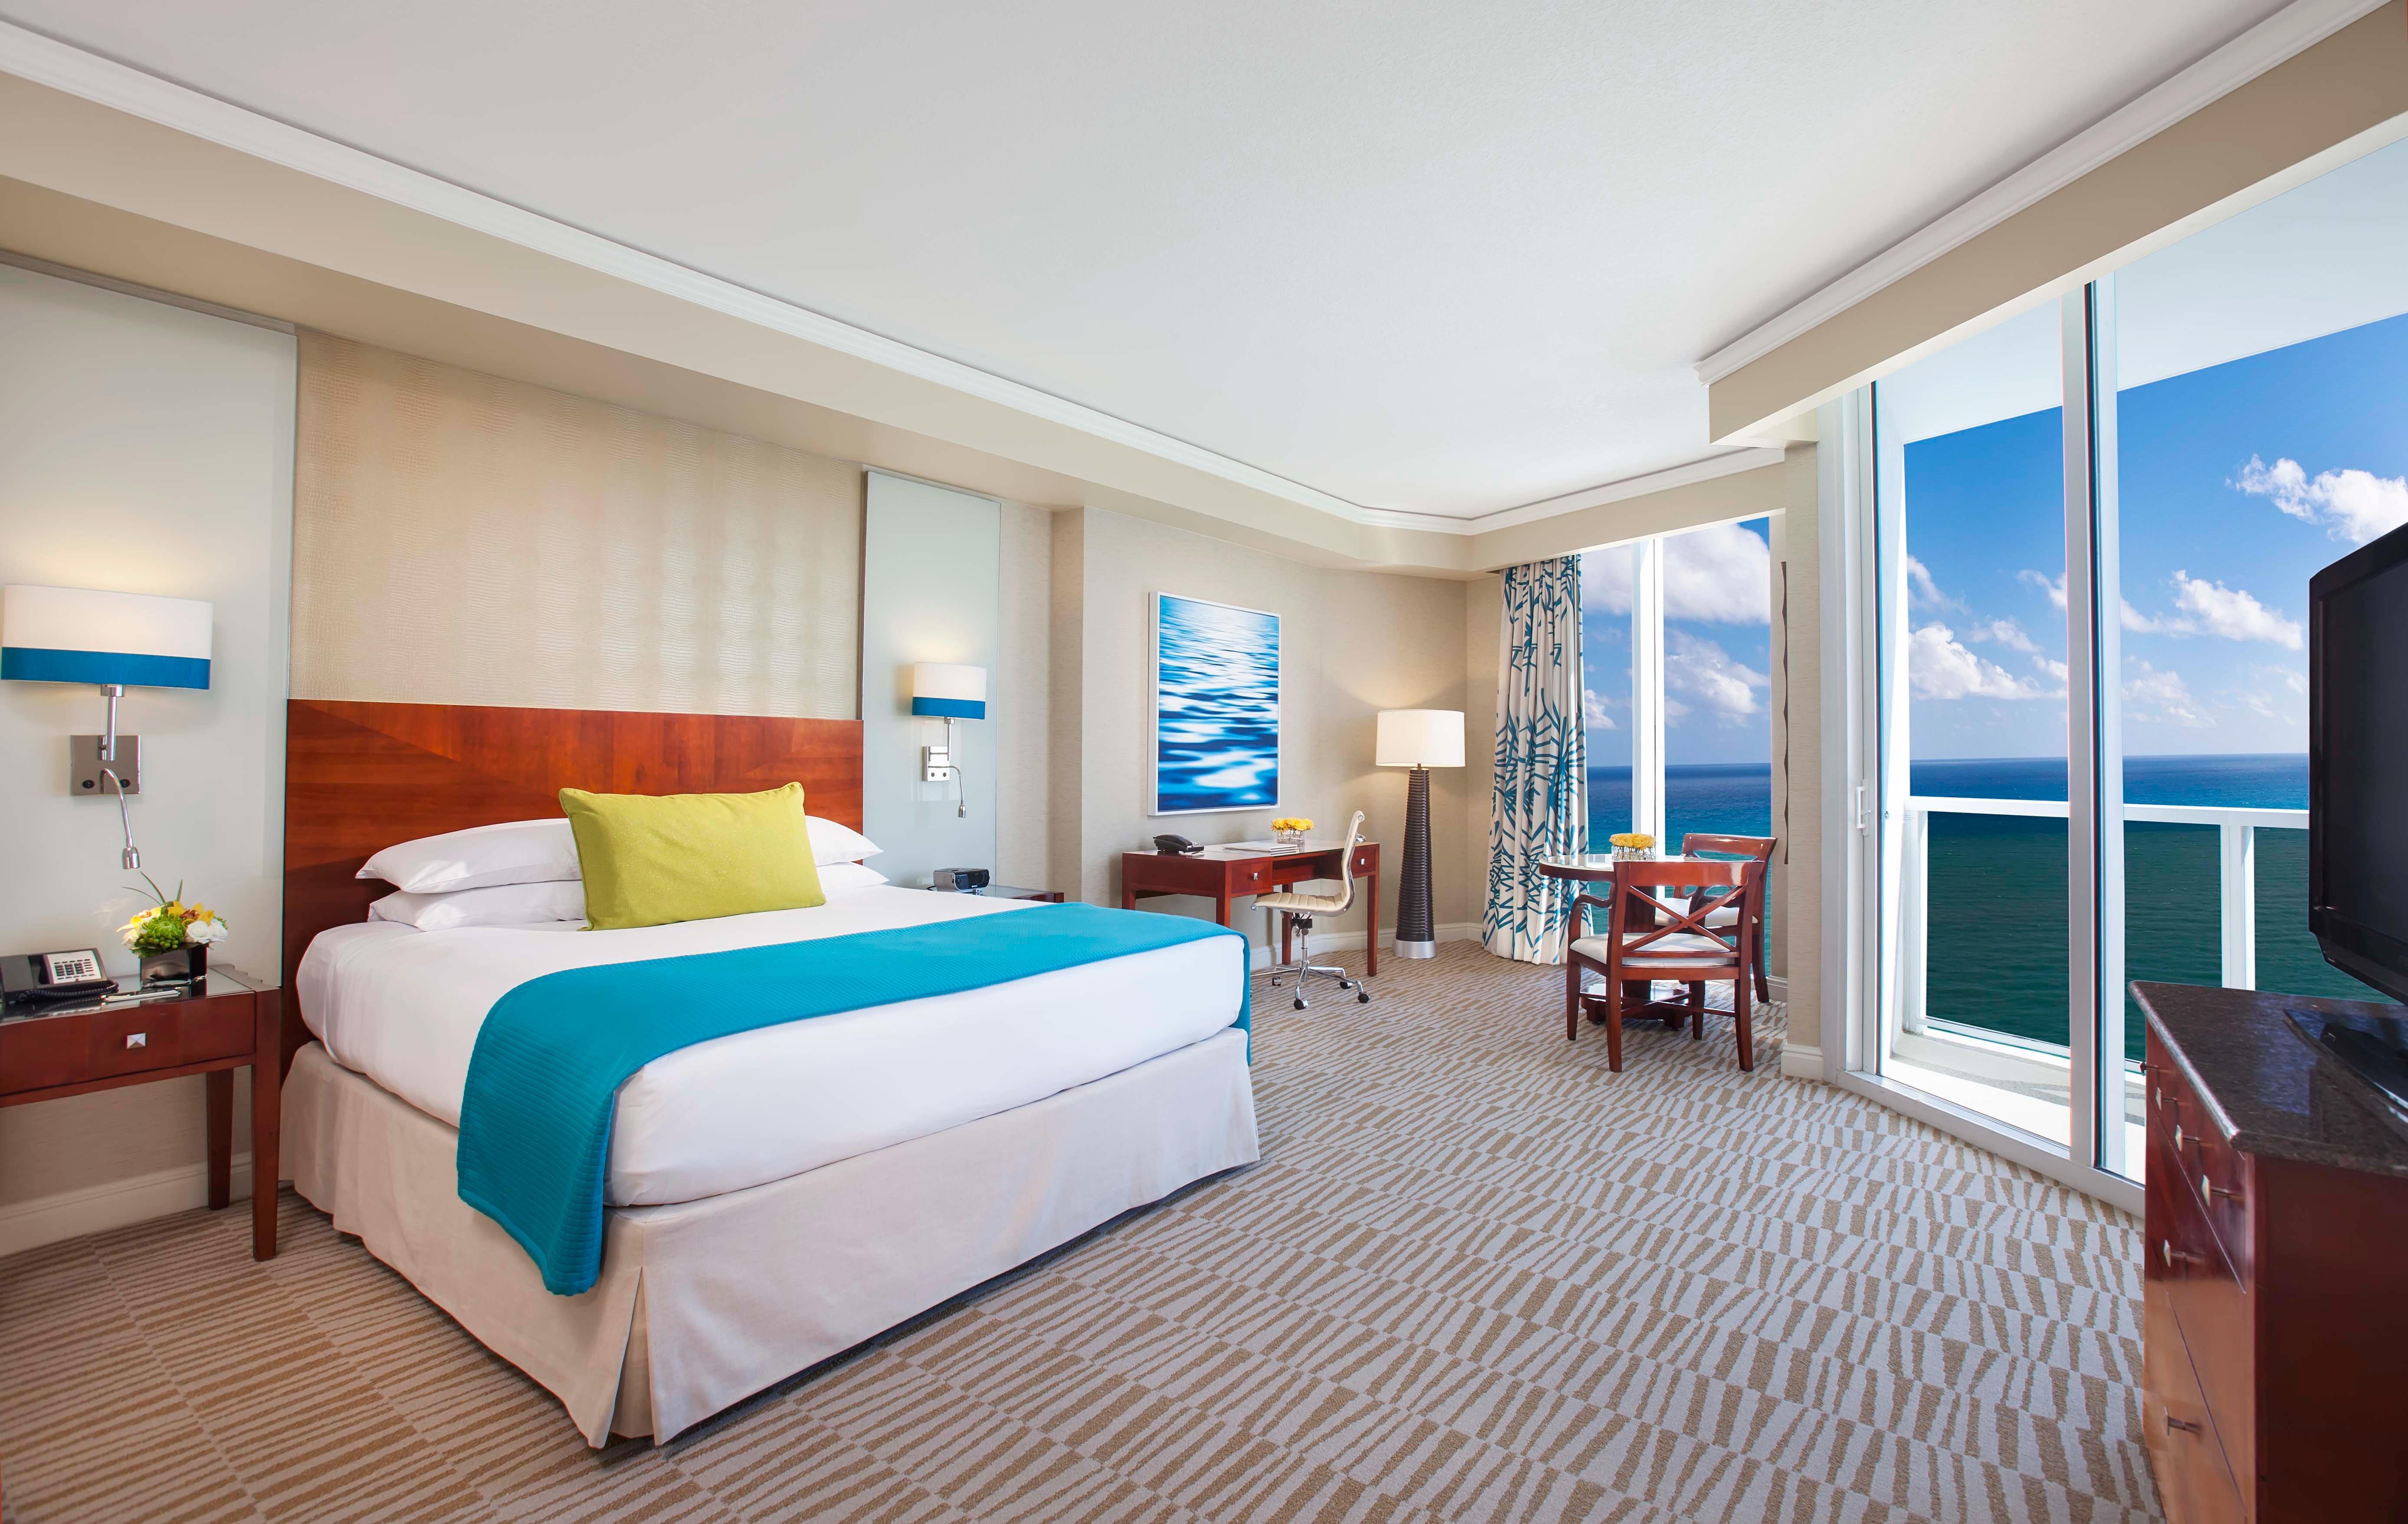 Bedroom property Suite condominium Resort home living room Villa Modern flat